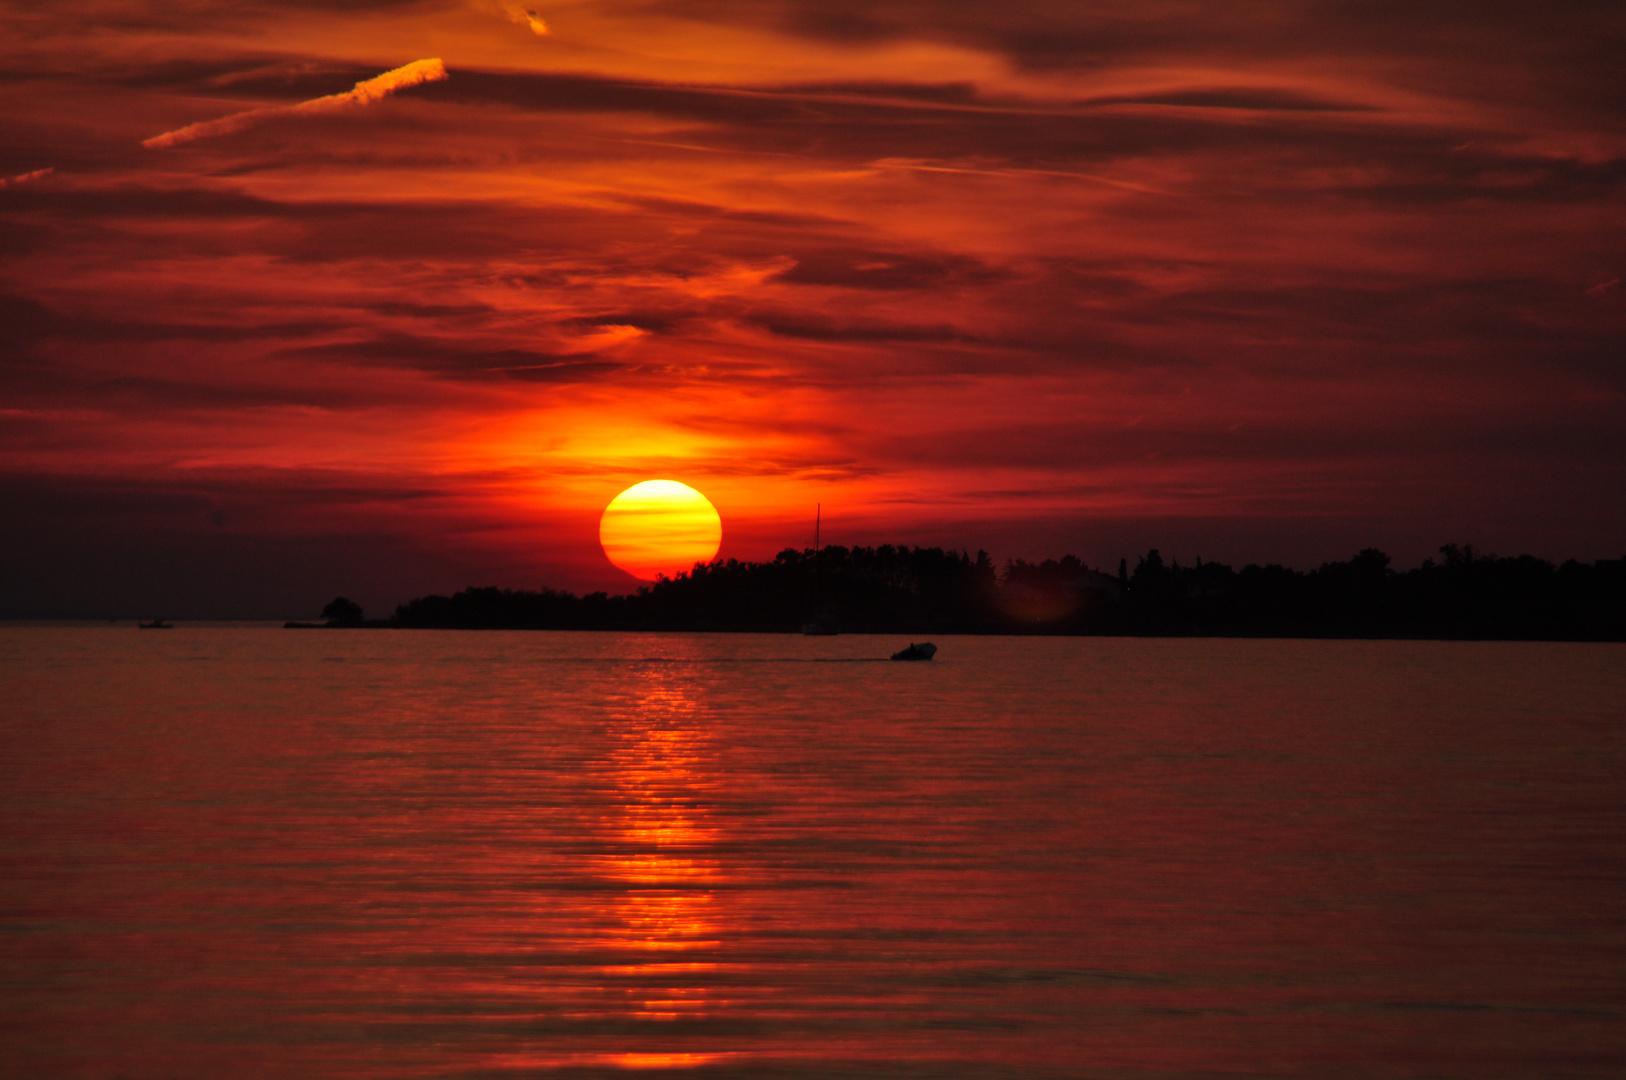 Sonnenuntergang an der Adria bei Zadar